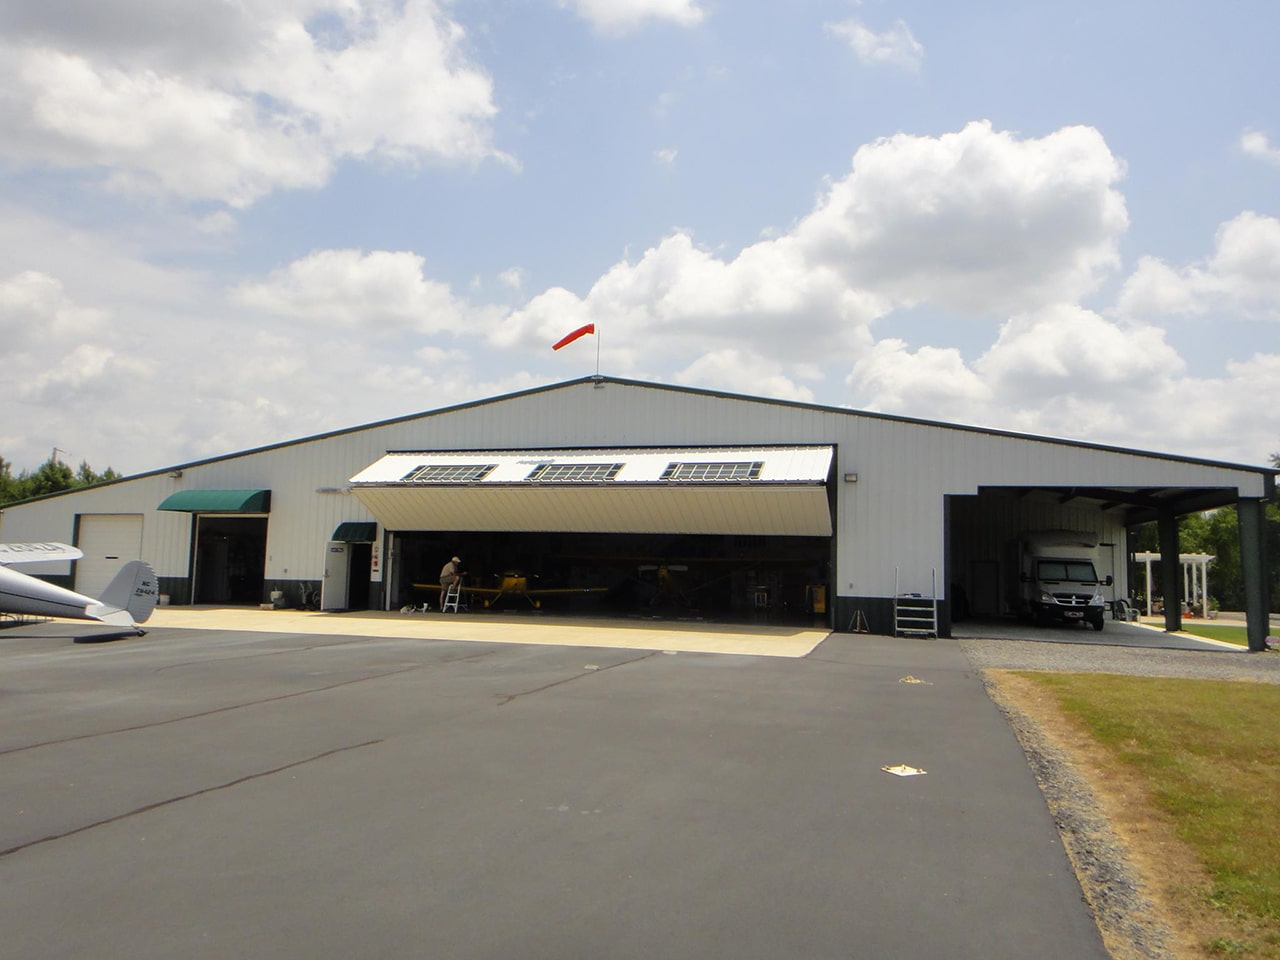 Airplane Hangar Covered Parking